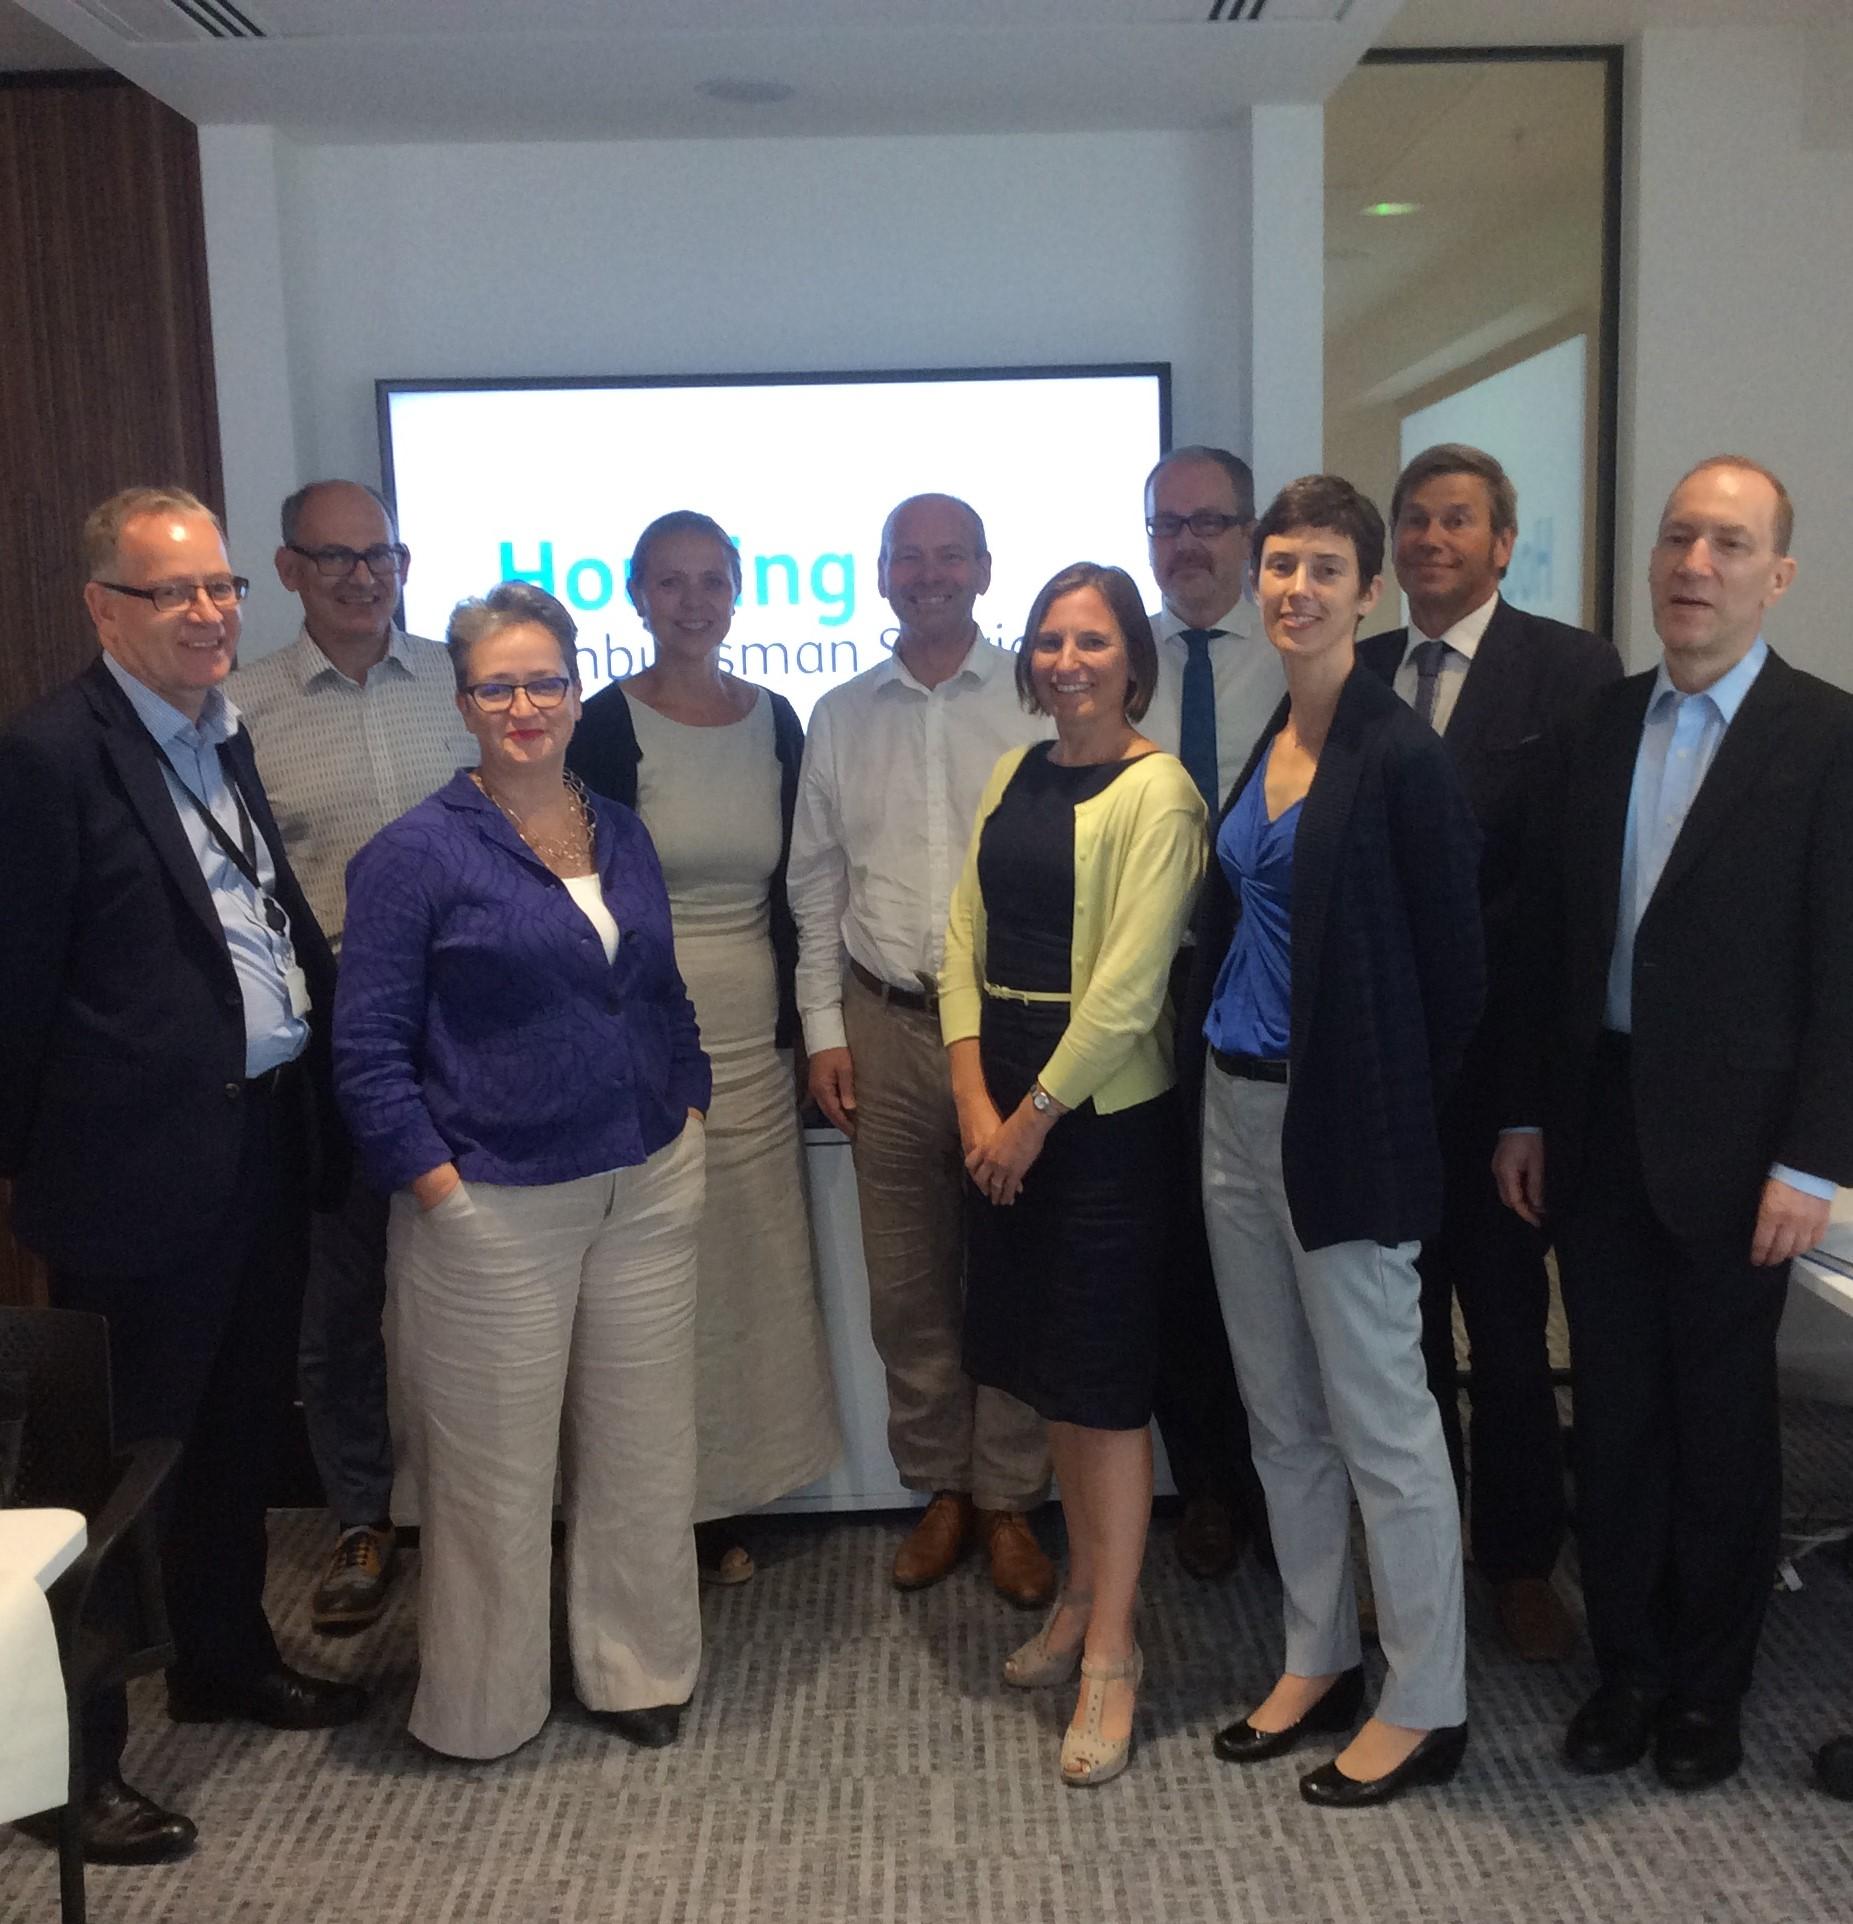 Panel of advisors group photo